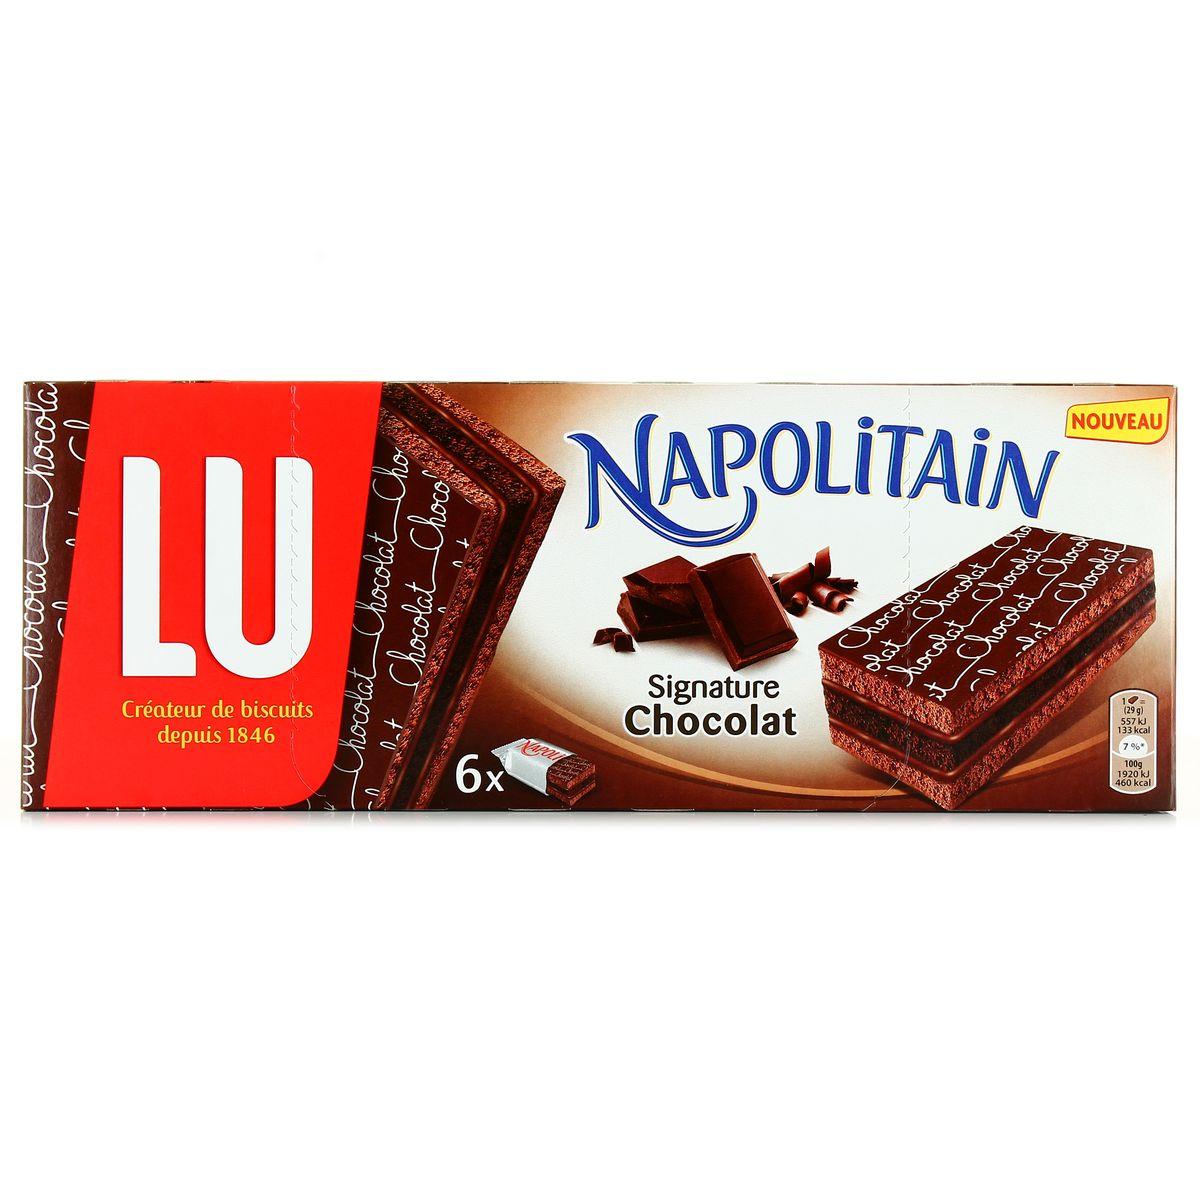 LU Napolitain choc.signature 174g – Phocéene de Distribution